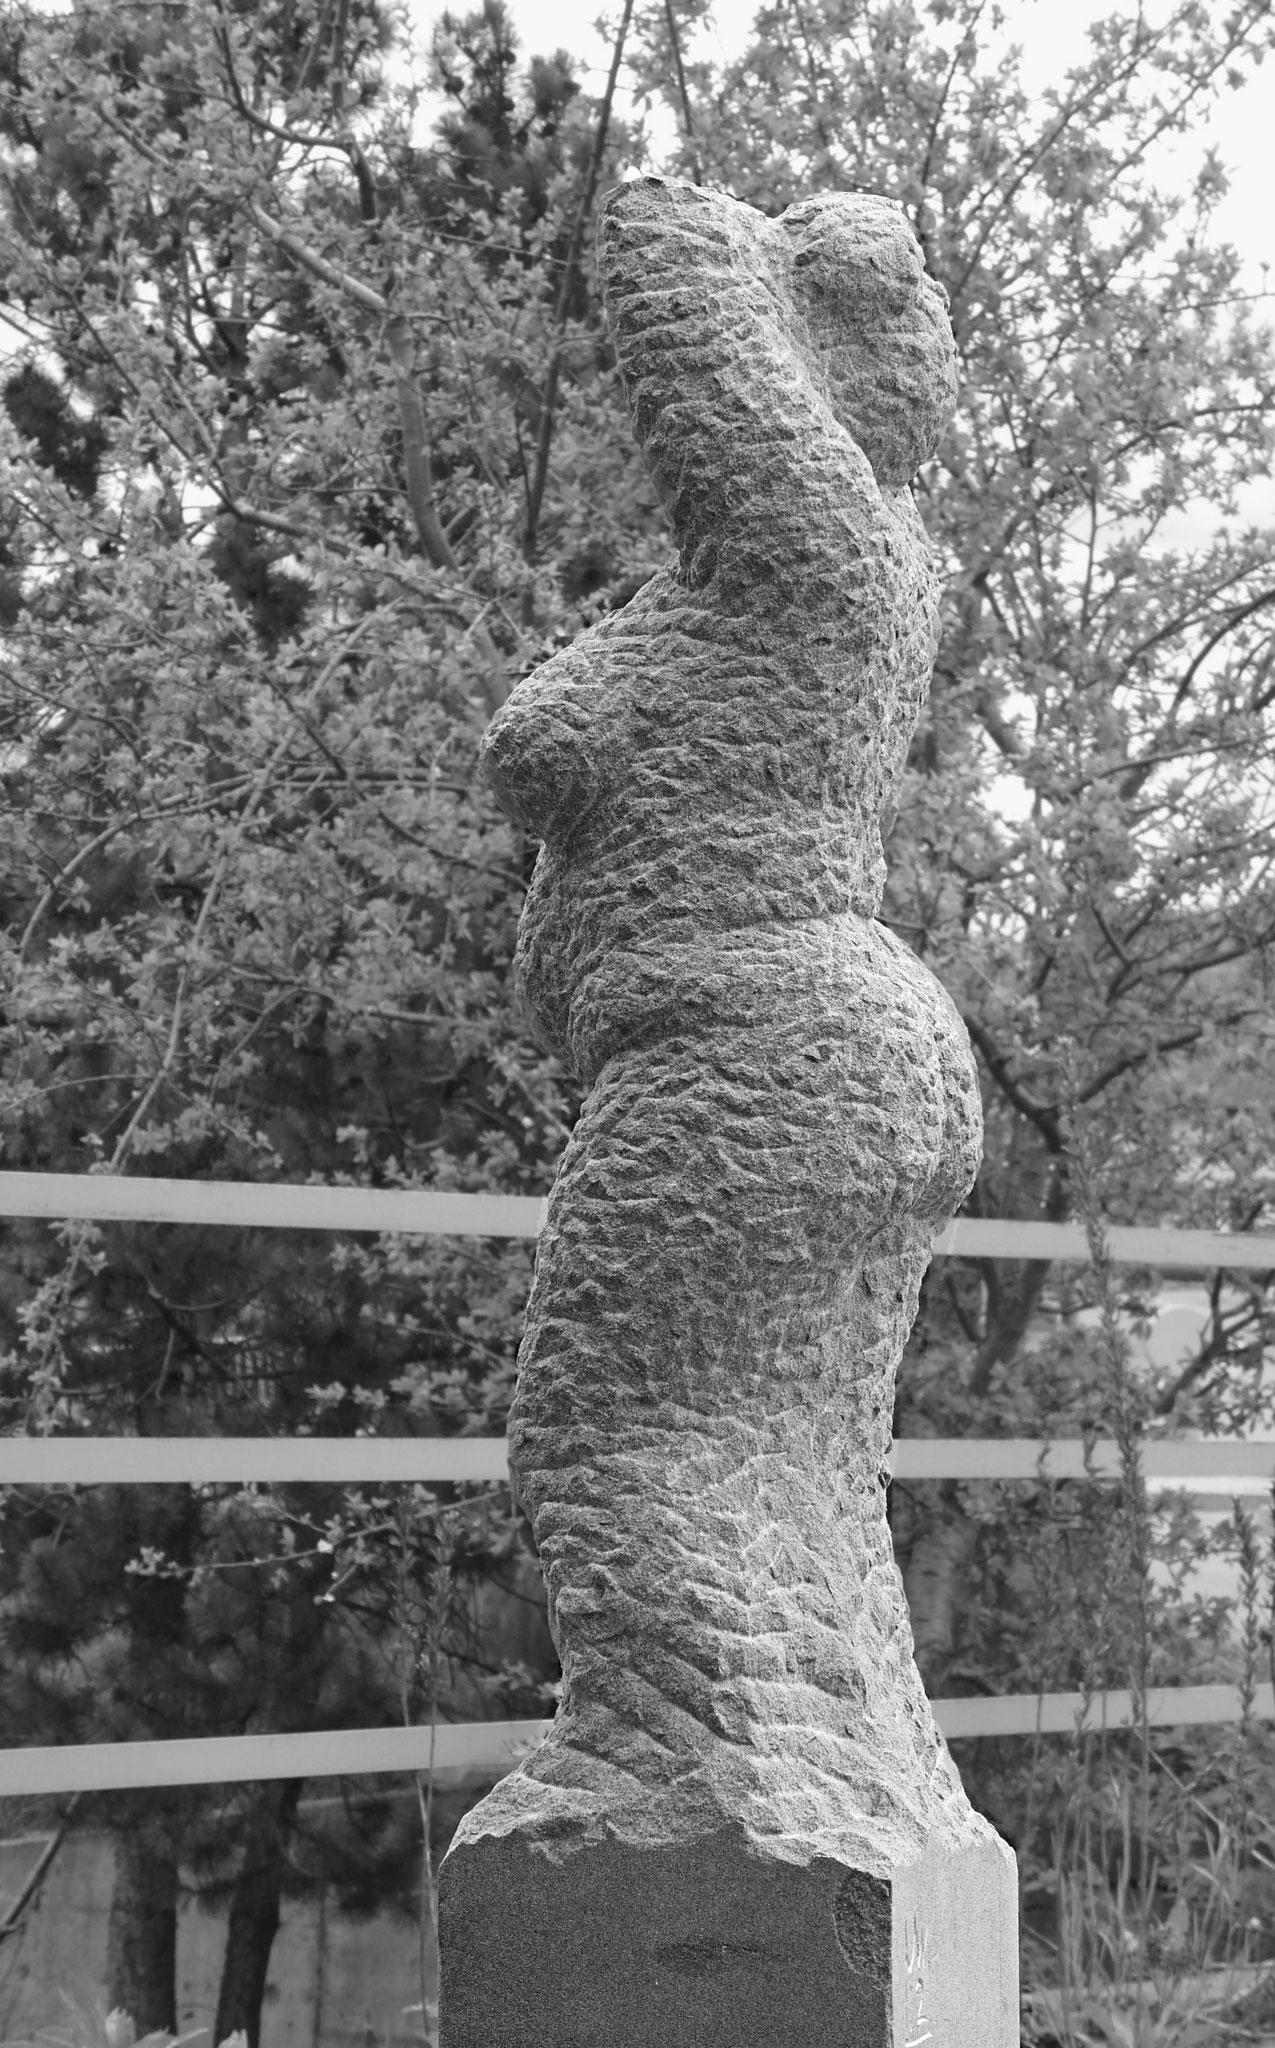 Nudo di donna di pietra arenaria   -   Bildhauerei Wiedemer Basadingen